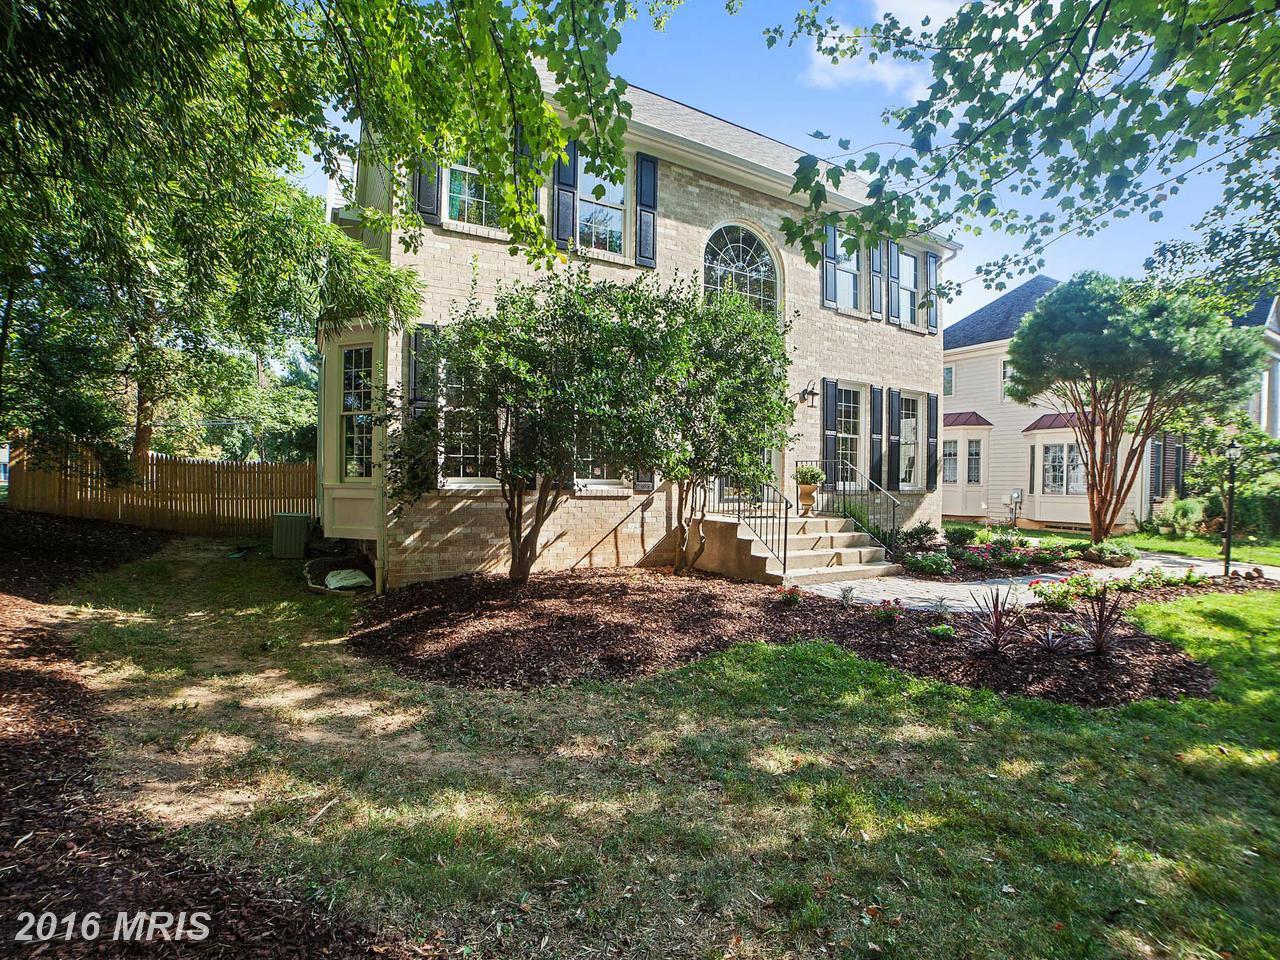 Homes For Sale Near White Oak Middle School